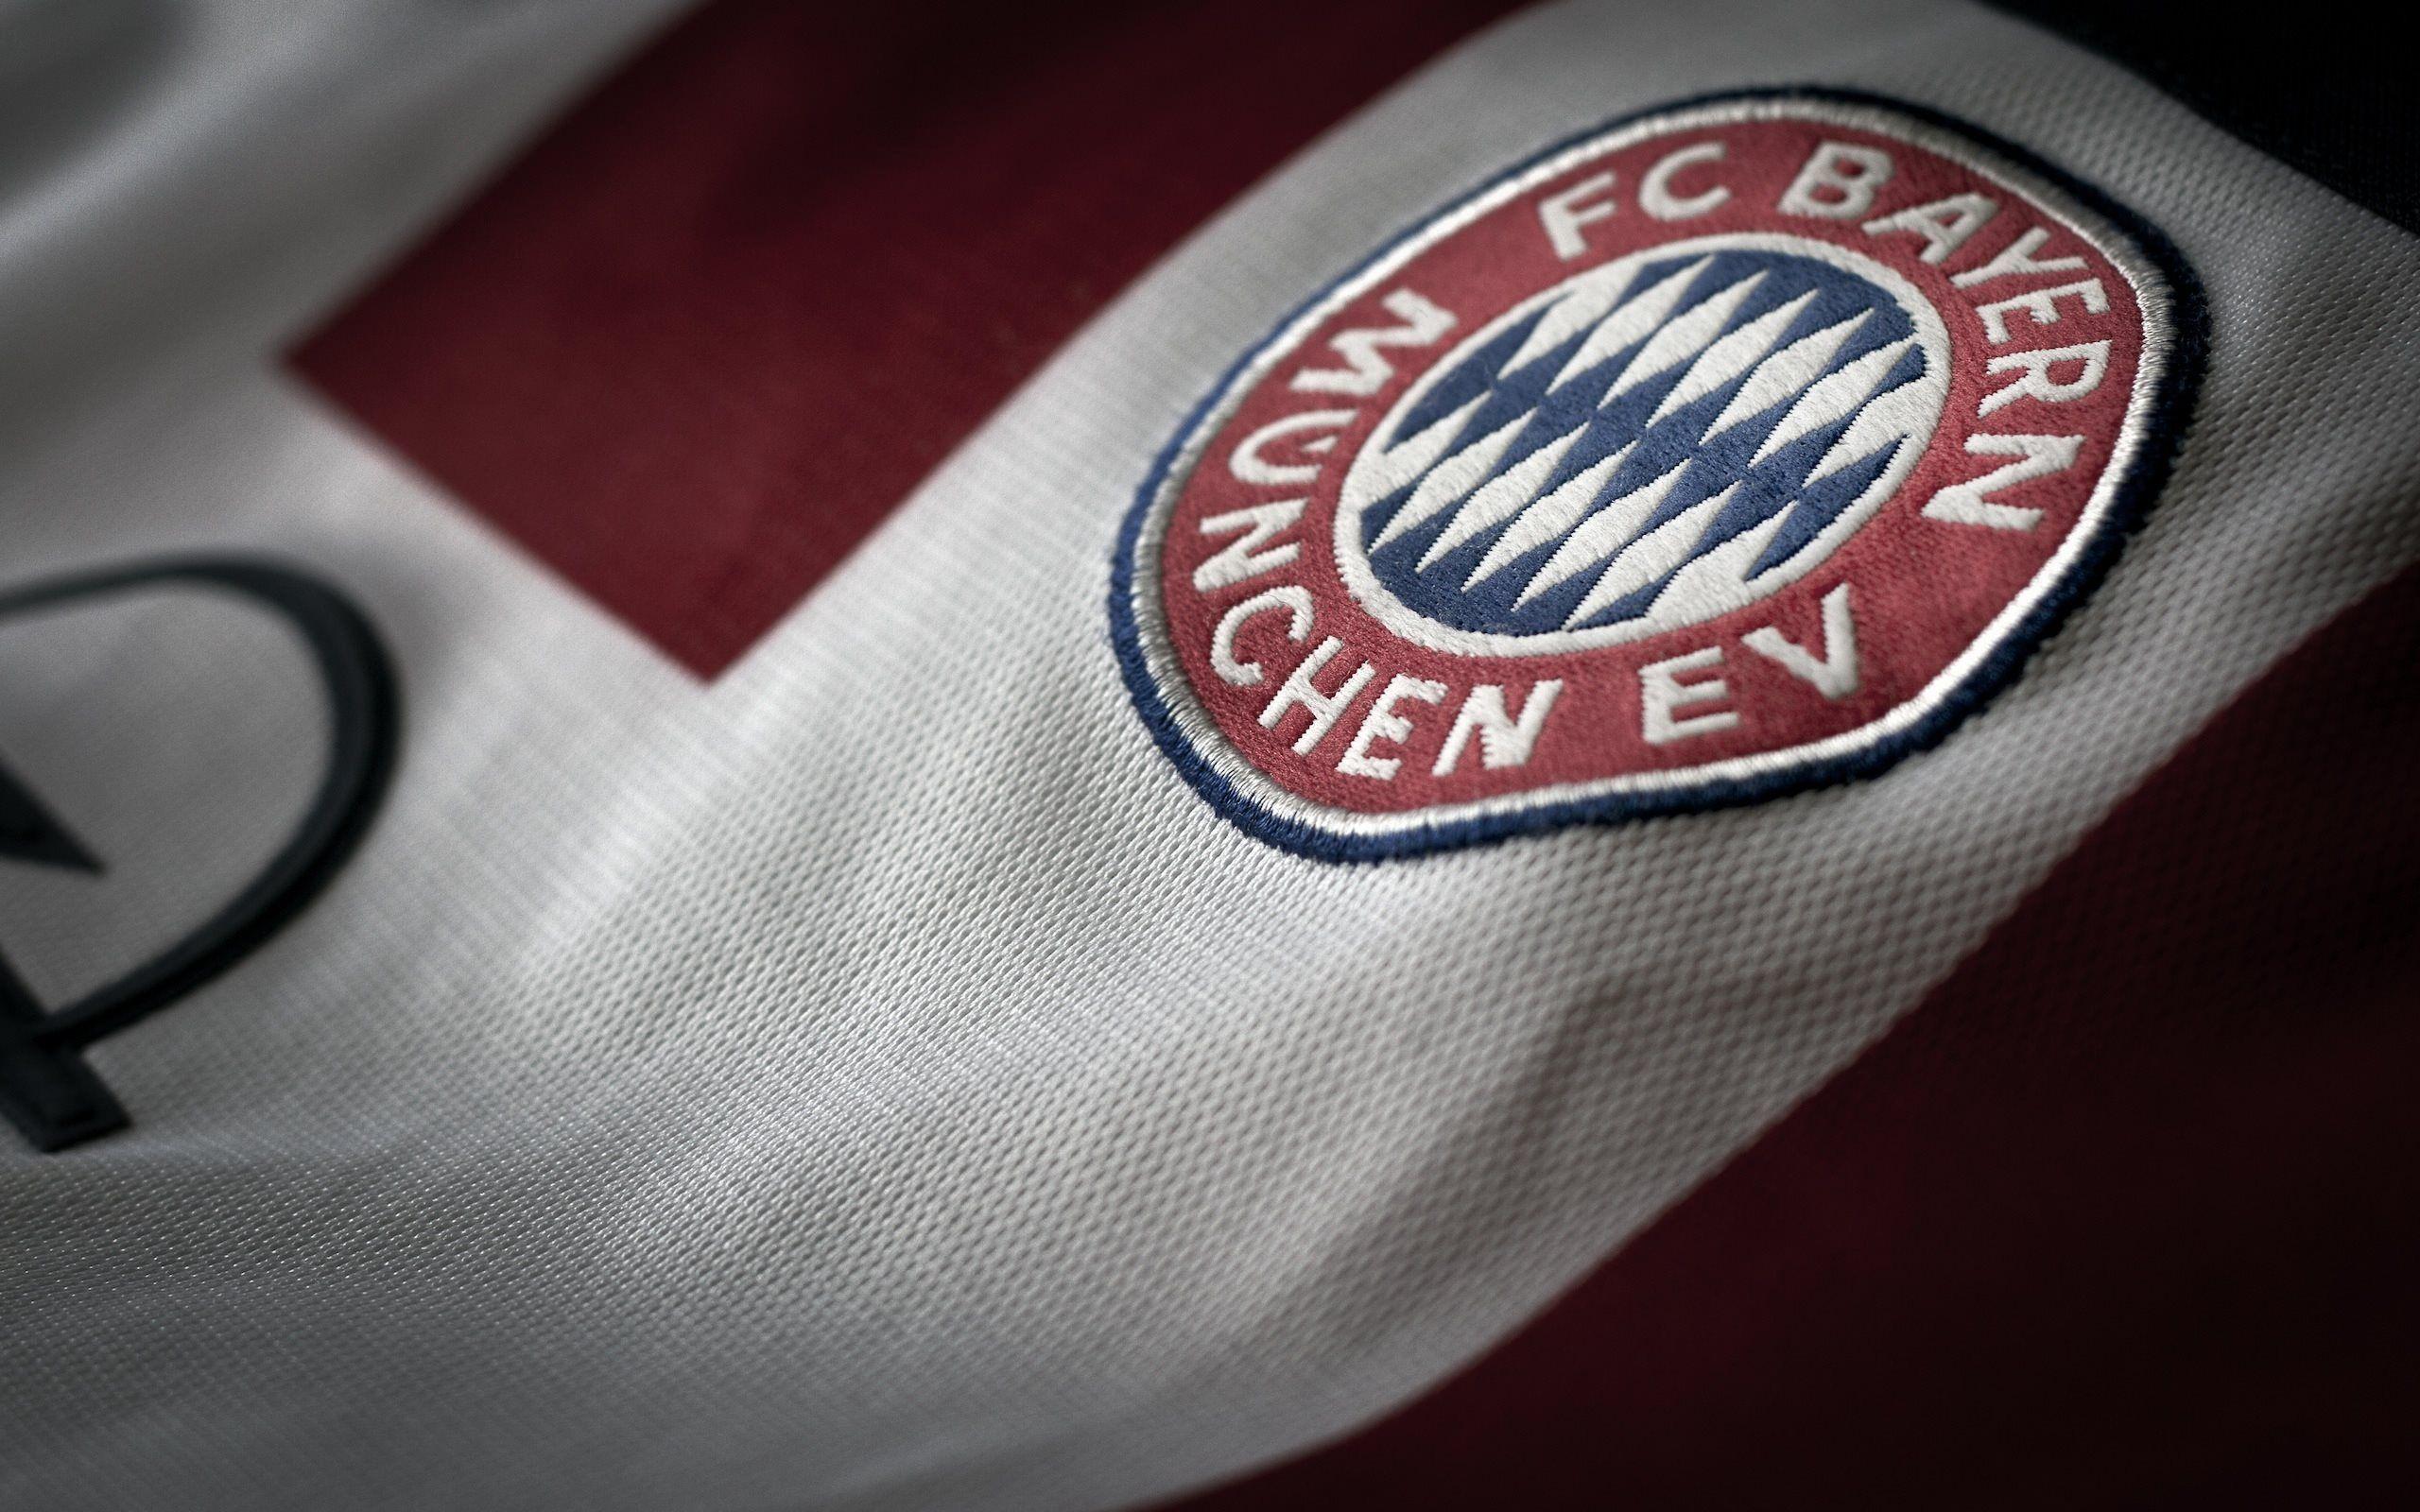 Bayern Munich Wallpaper For Android Bayern Munich Wallpapers Bayern Munich Bayern